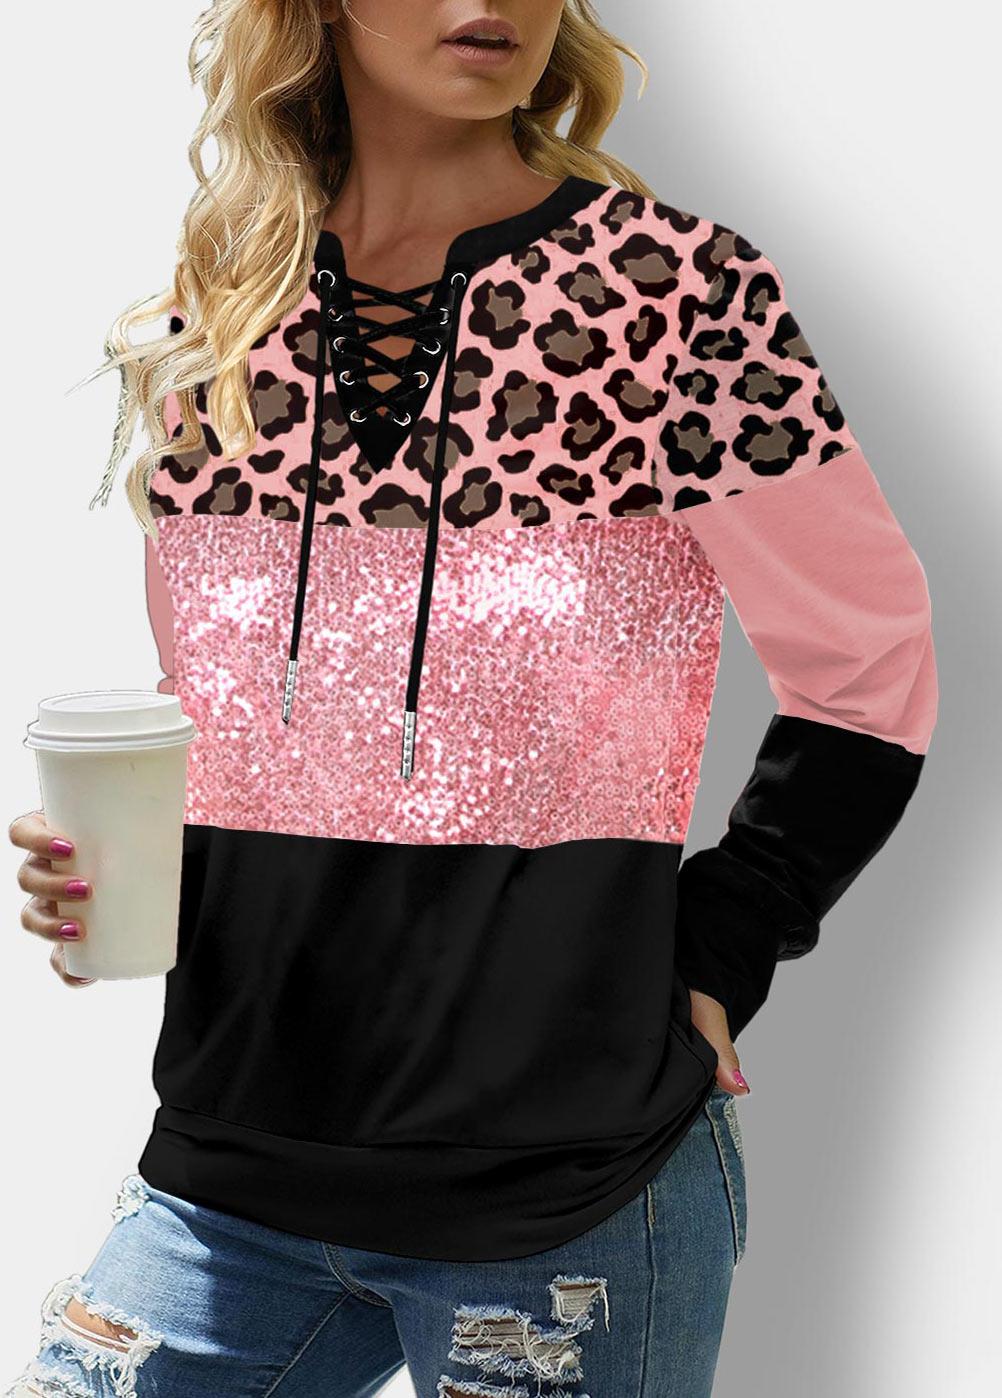 ROTITA Sequin Panel Lace Up Leopard Sweatshirt